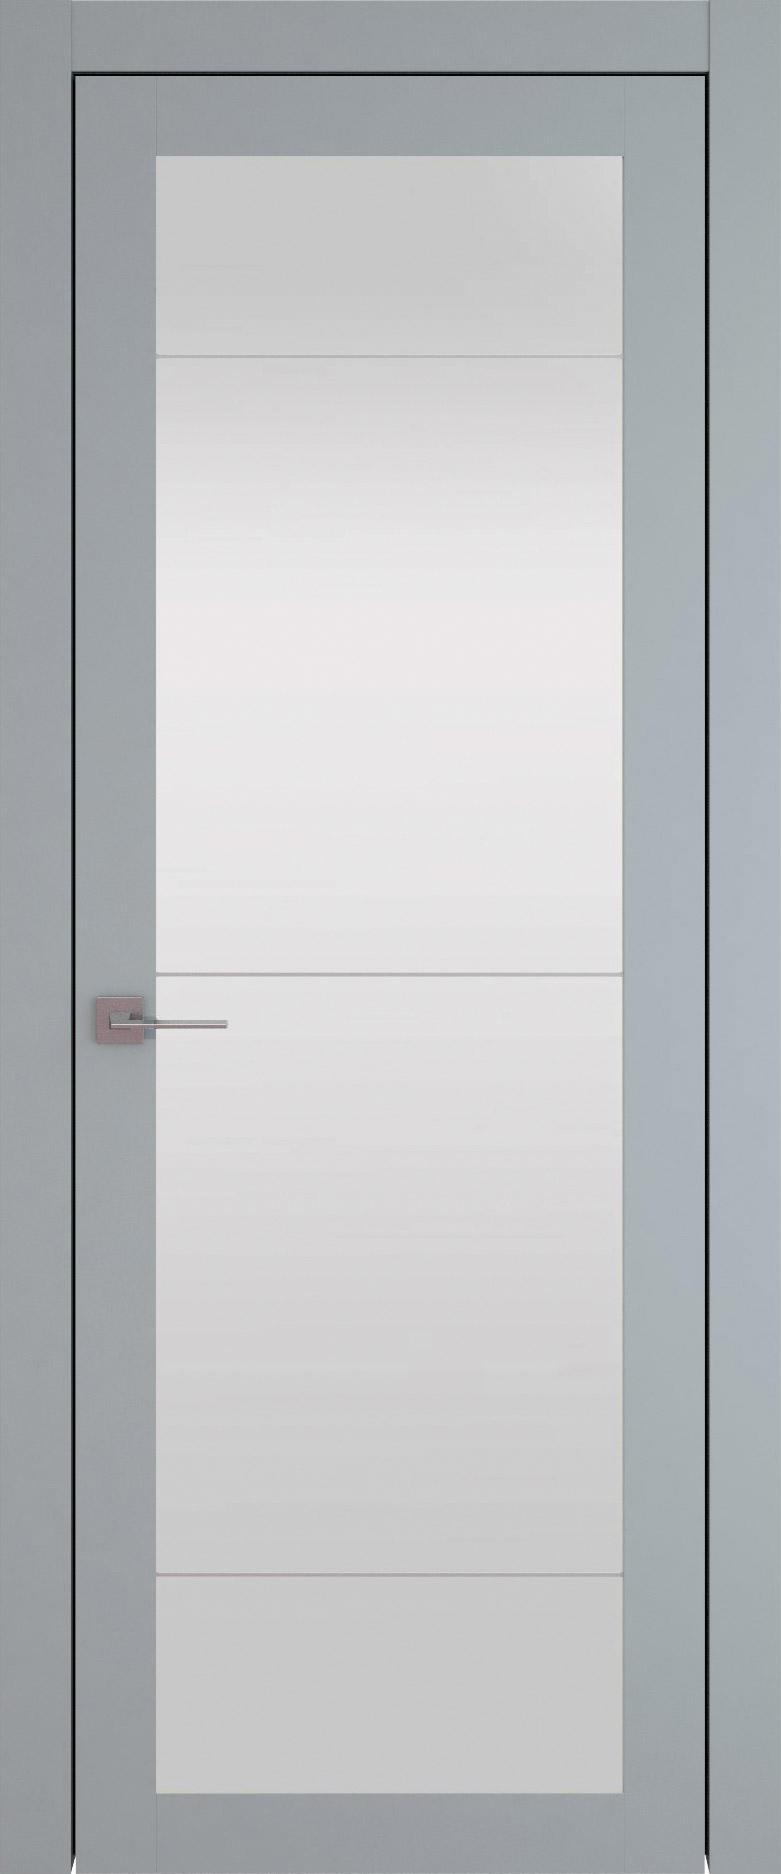 Tivoli З-3 цвет - Серебристо-серая эмаль (RAL 7045) Со стеклом (ДО)